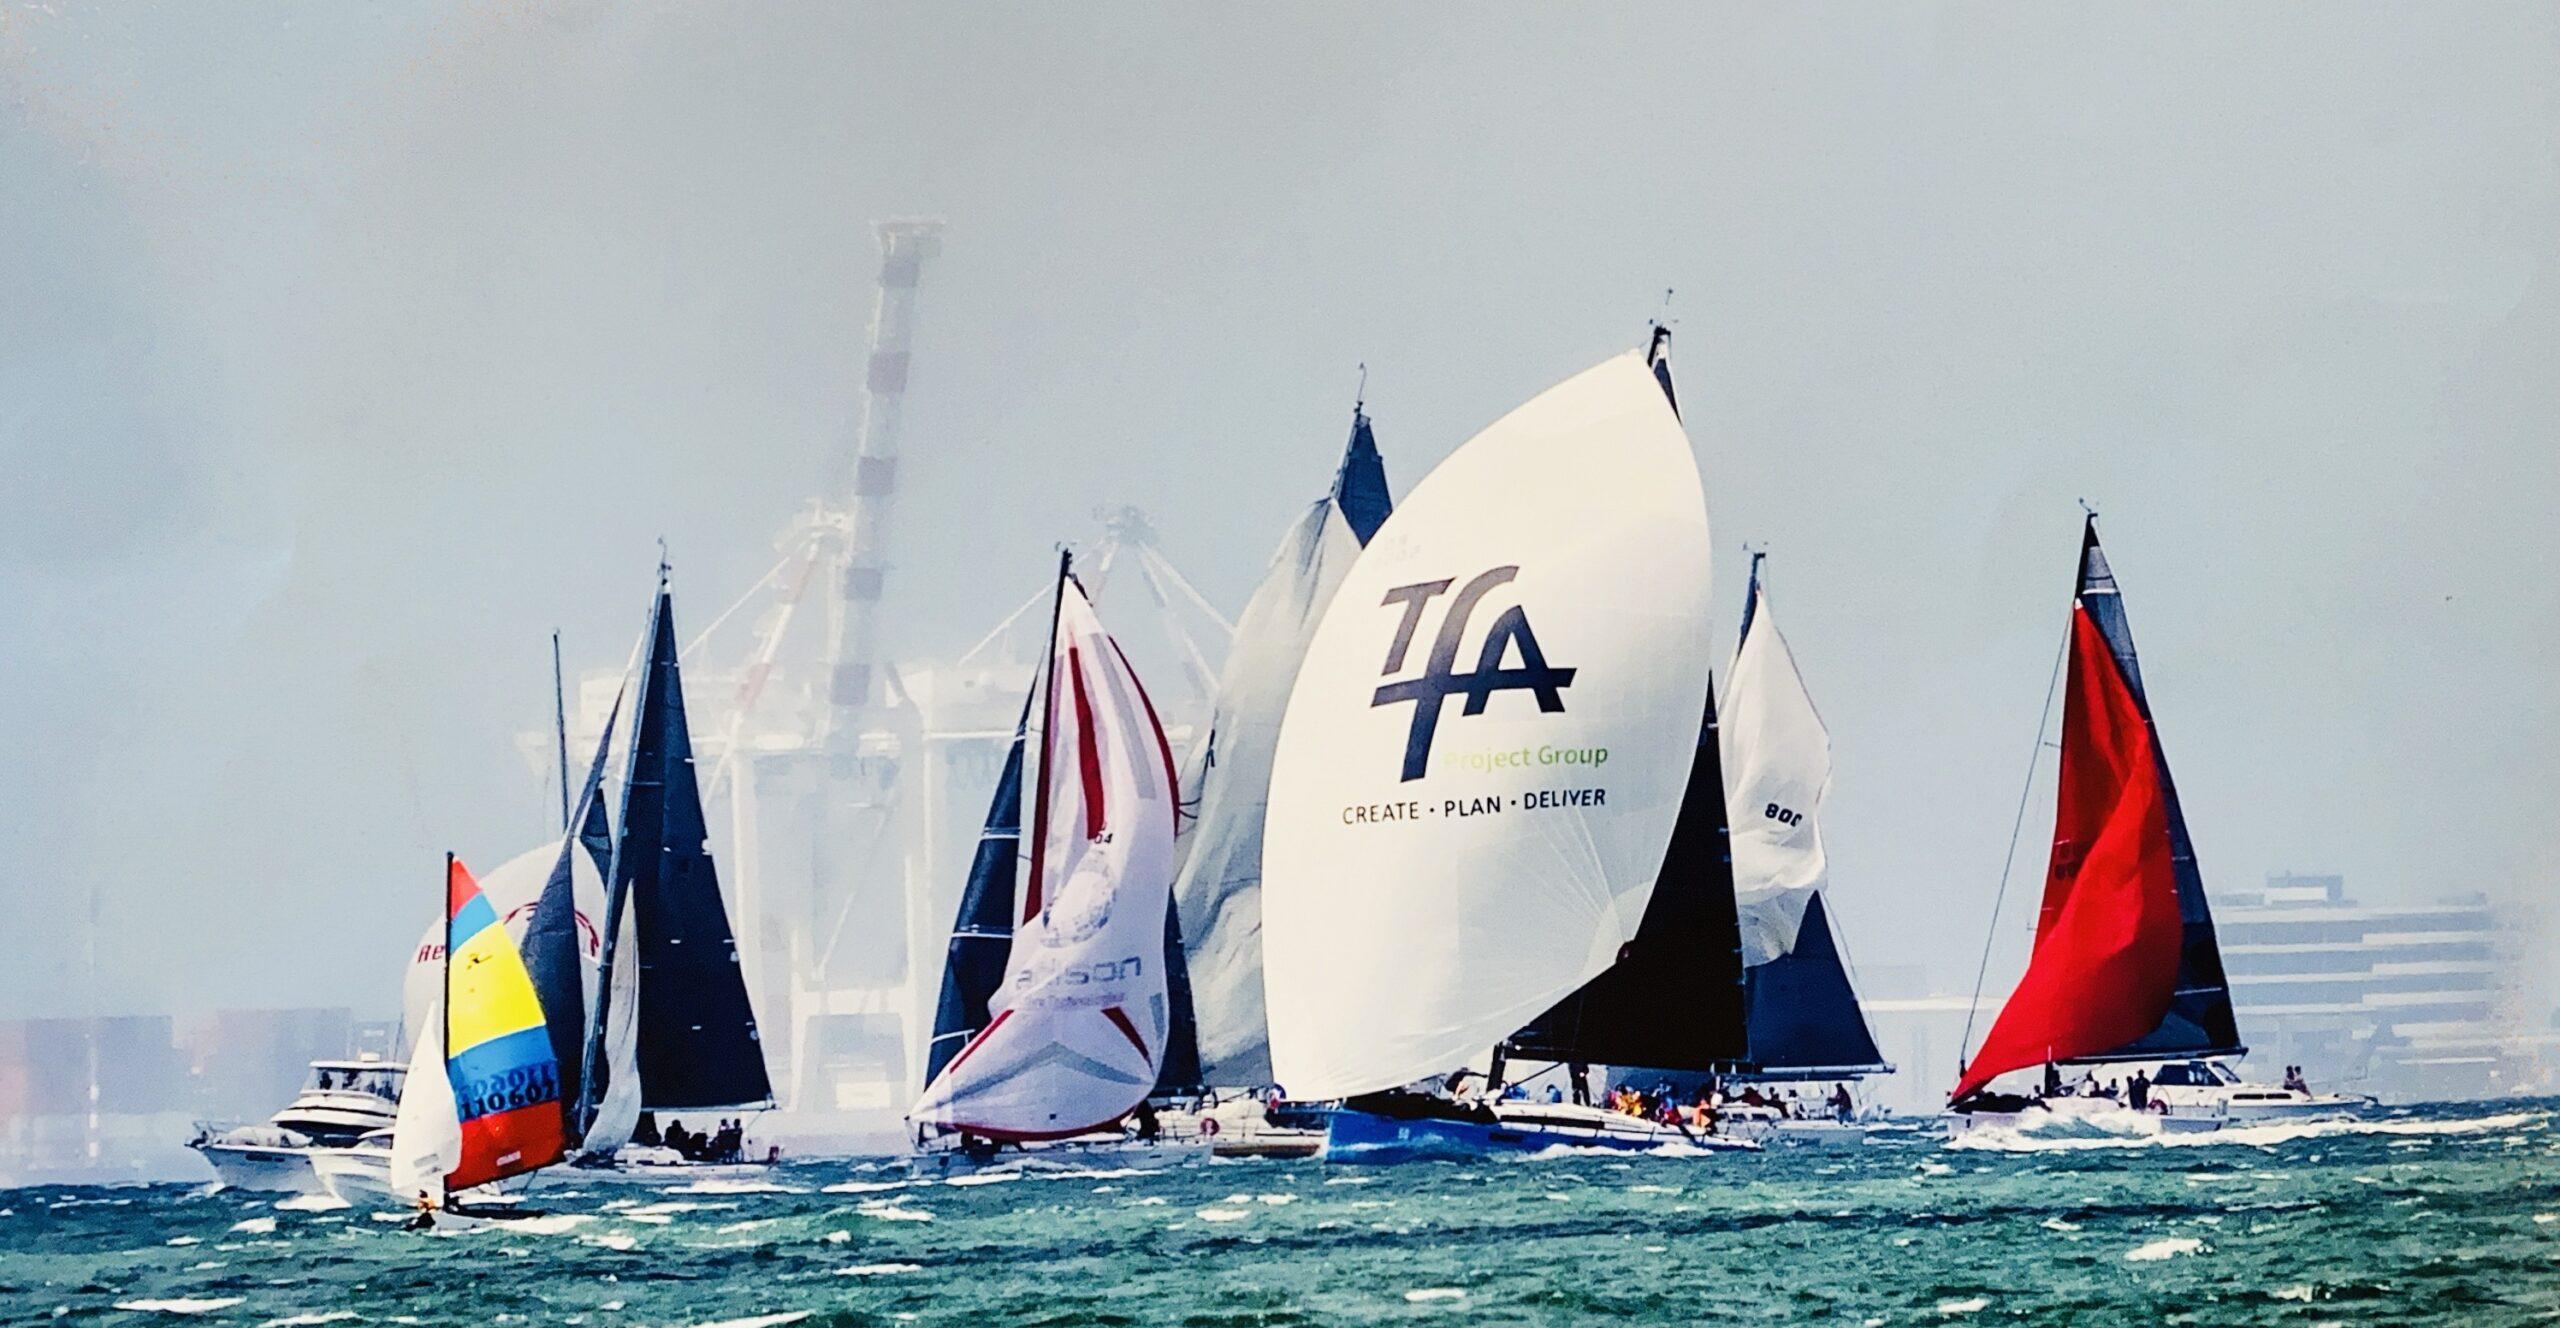 TfA Group Sponsorship